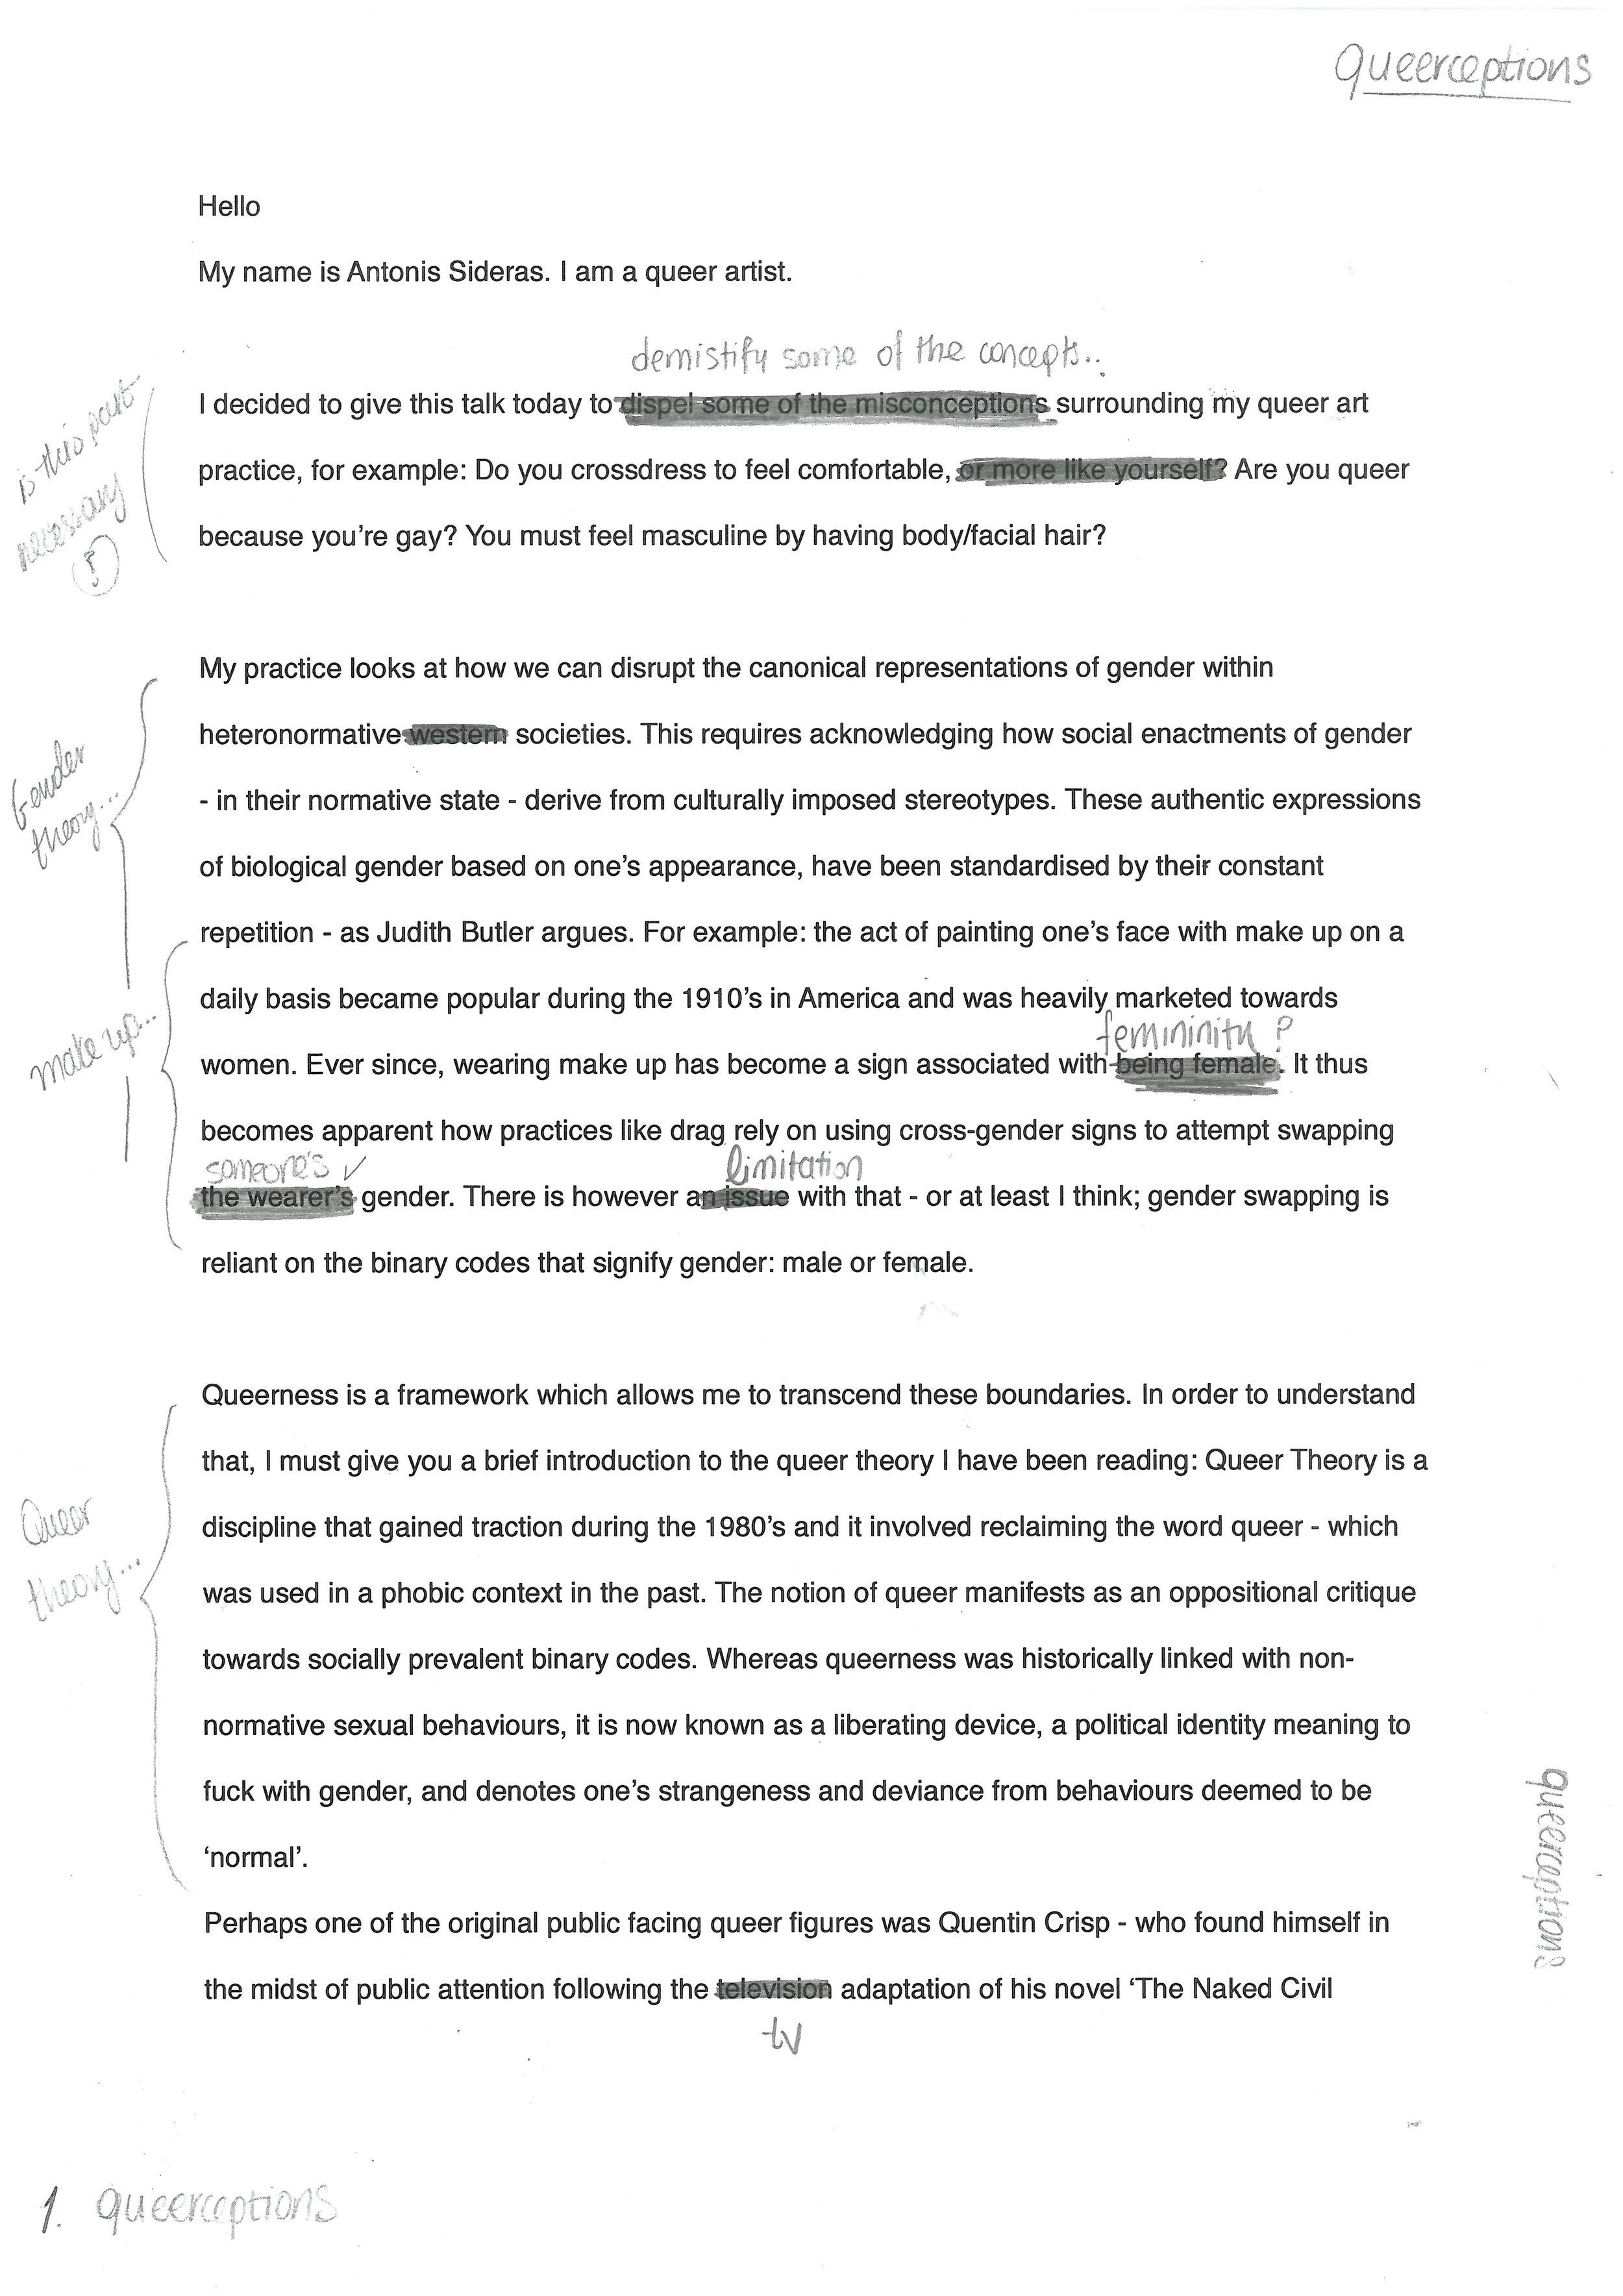 antonis sideras -queerceptions script page 1.jpg